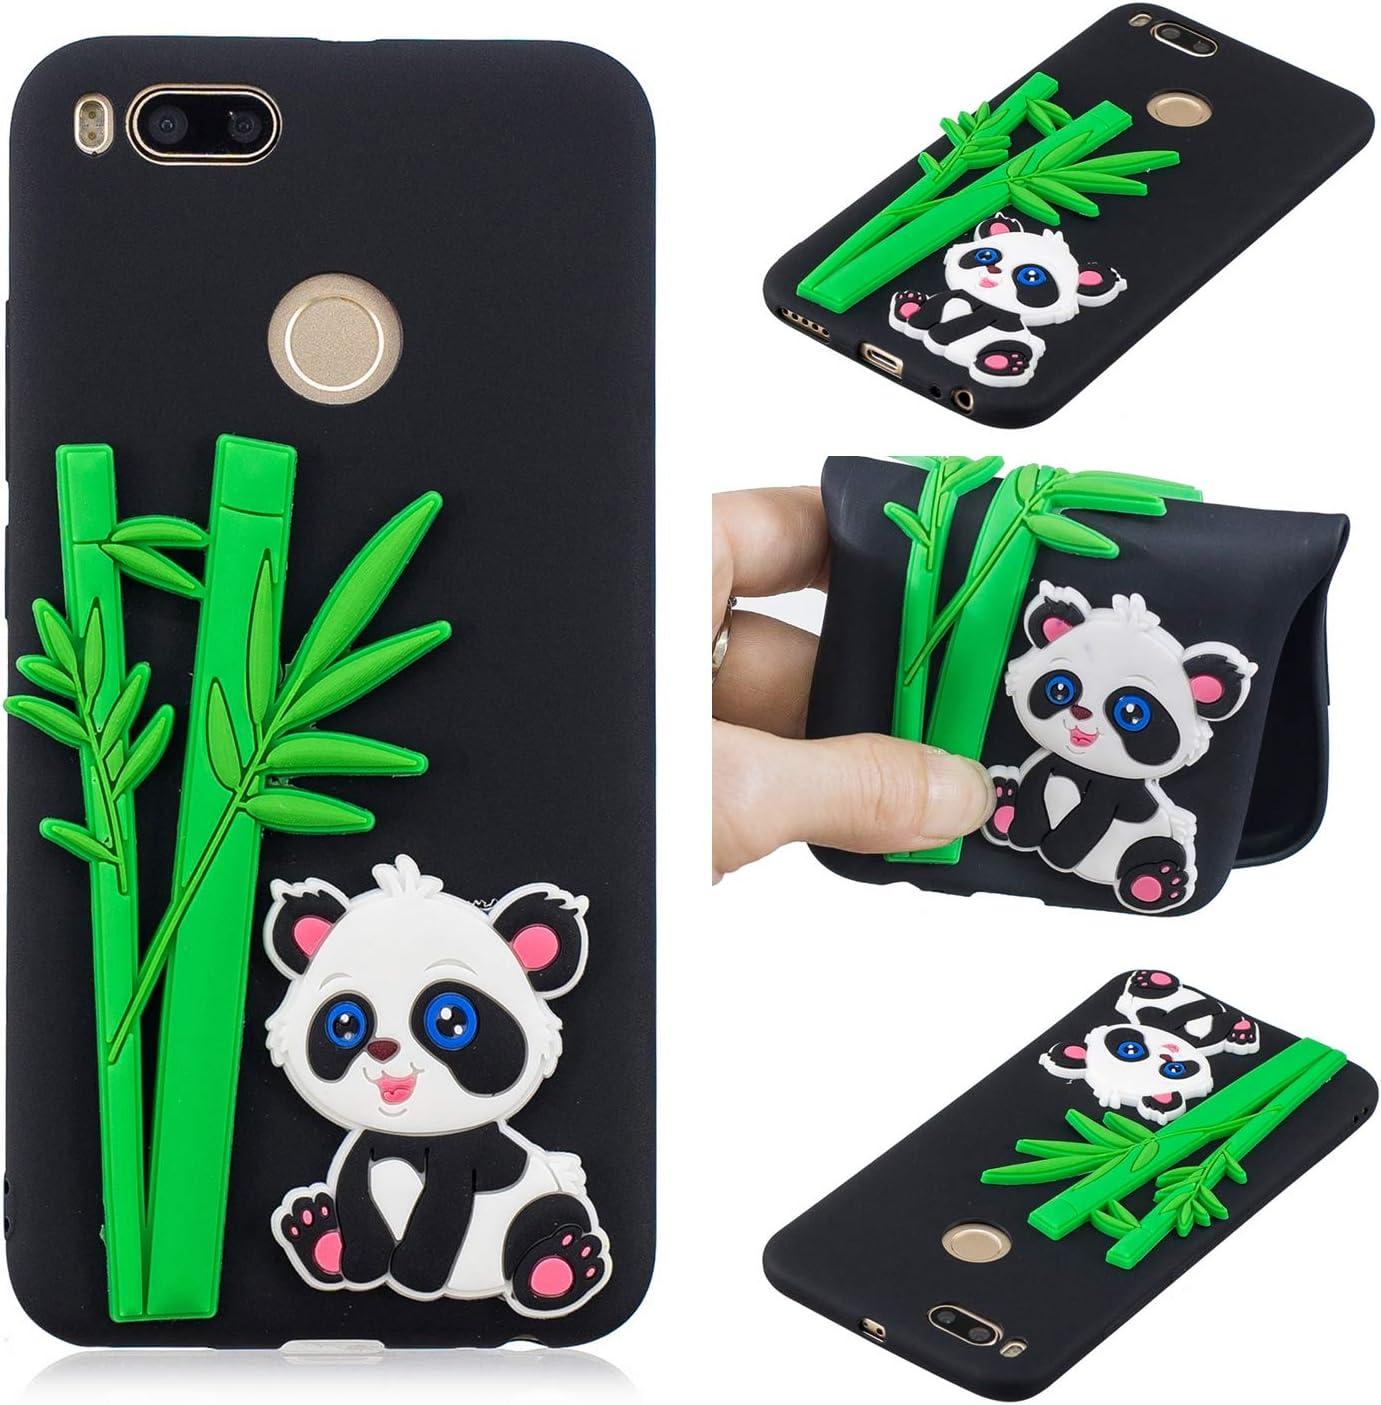 Funluna Funda Xiaomi Mi A1, 3D Bambú & Panda Patrón Slim TPU Suave Carcasa Silicona Gel Anti-Rasguño Protectora Bumper Case para Xiaomi Mi A1